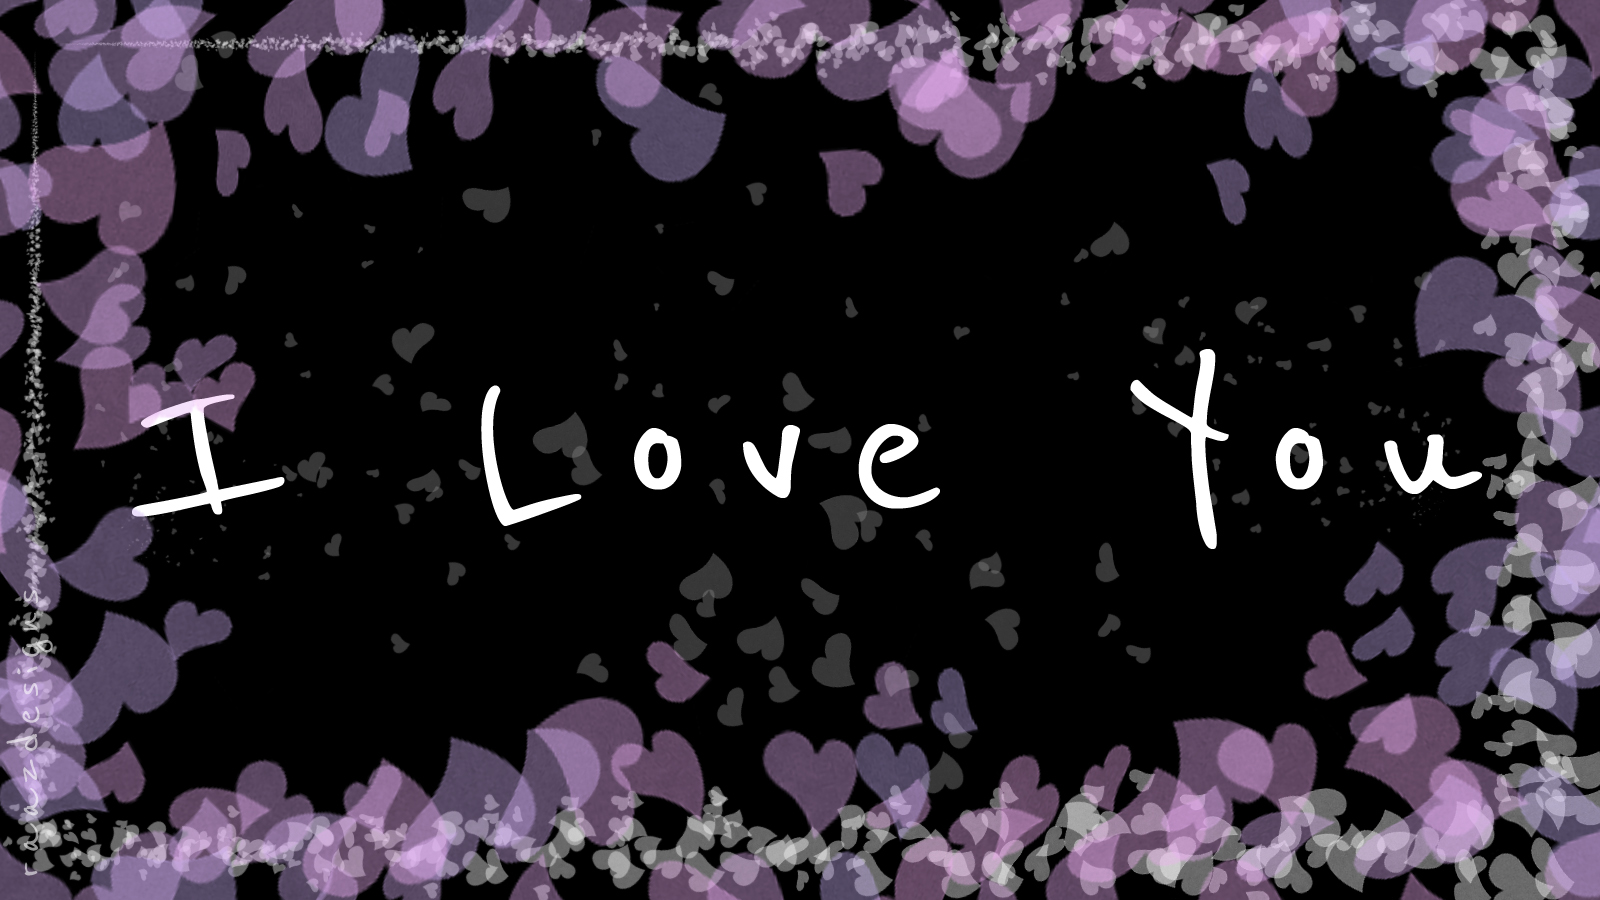 http://2.bp.blogspot.com/-7_Dlc1VFq6s/TzEzlk3PJ2I/AAAAAAAAETc/02CyGuxS2a8/s1600/i+love+u.raazdesigns.jpg